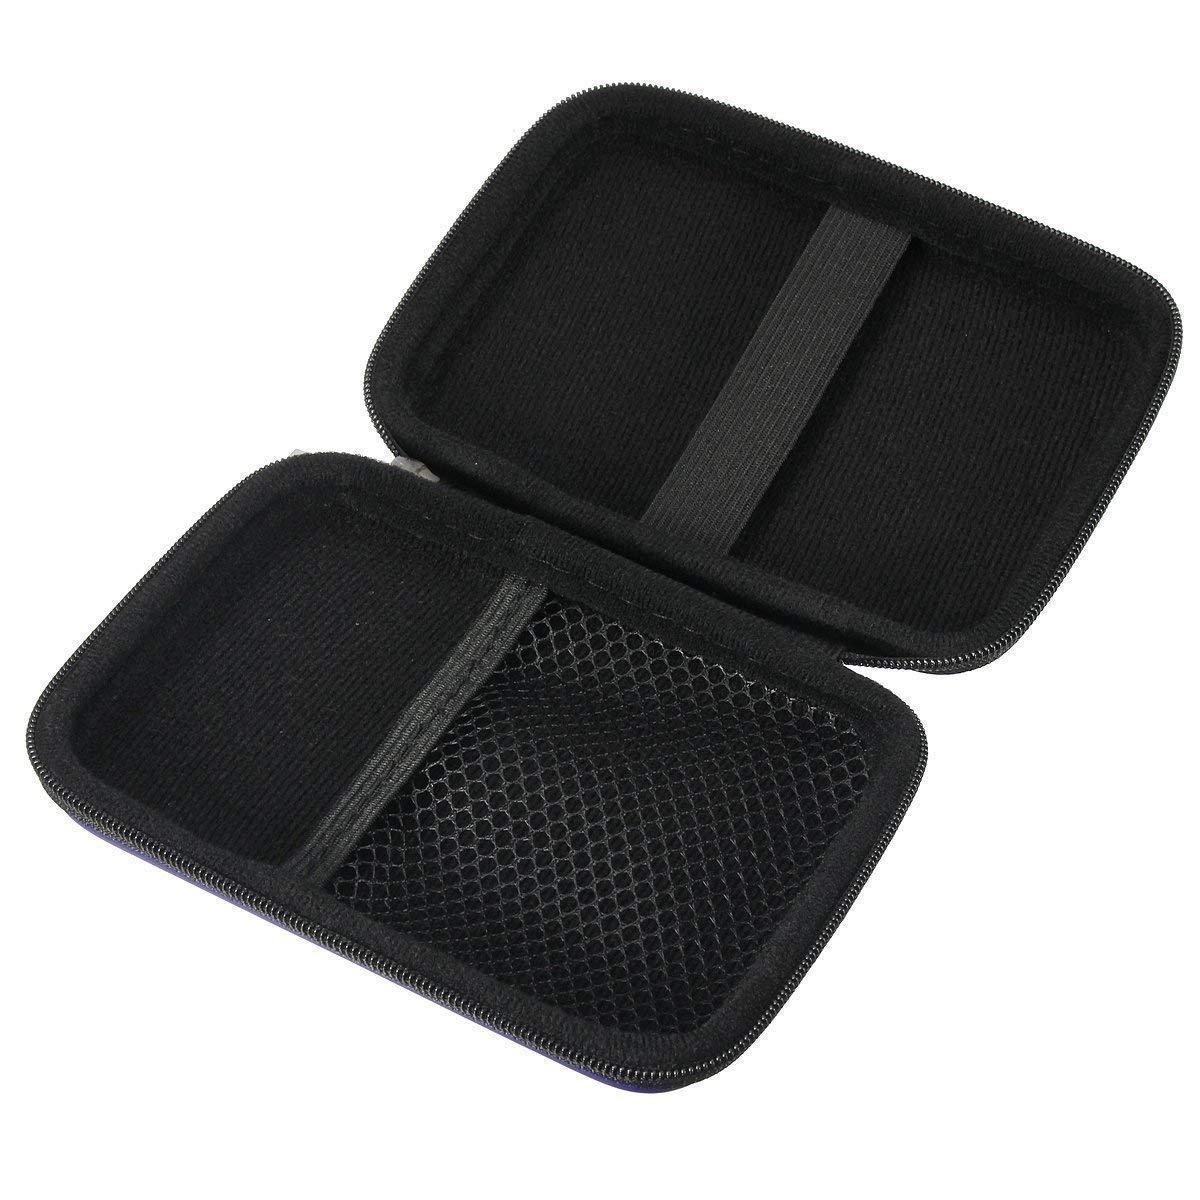 Negro Nikgic 2,5 Paquete Duro Externo Paquete Disco Duro Port/átil PU Funda Rigida con Cremallera para Disco Duro 1PC Accesorios de Disco Duro